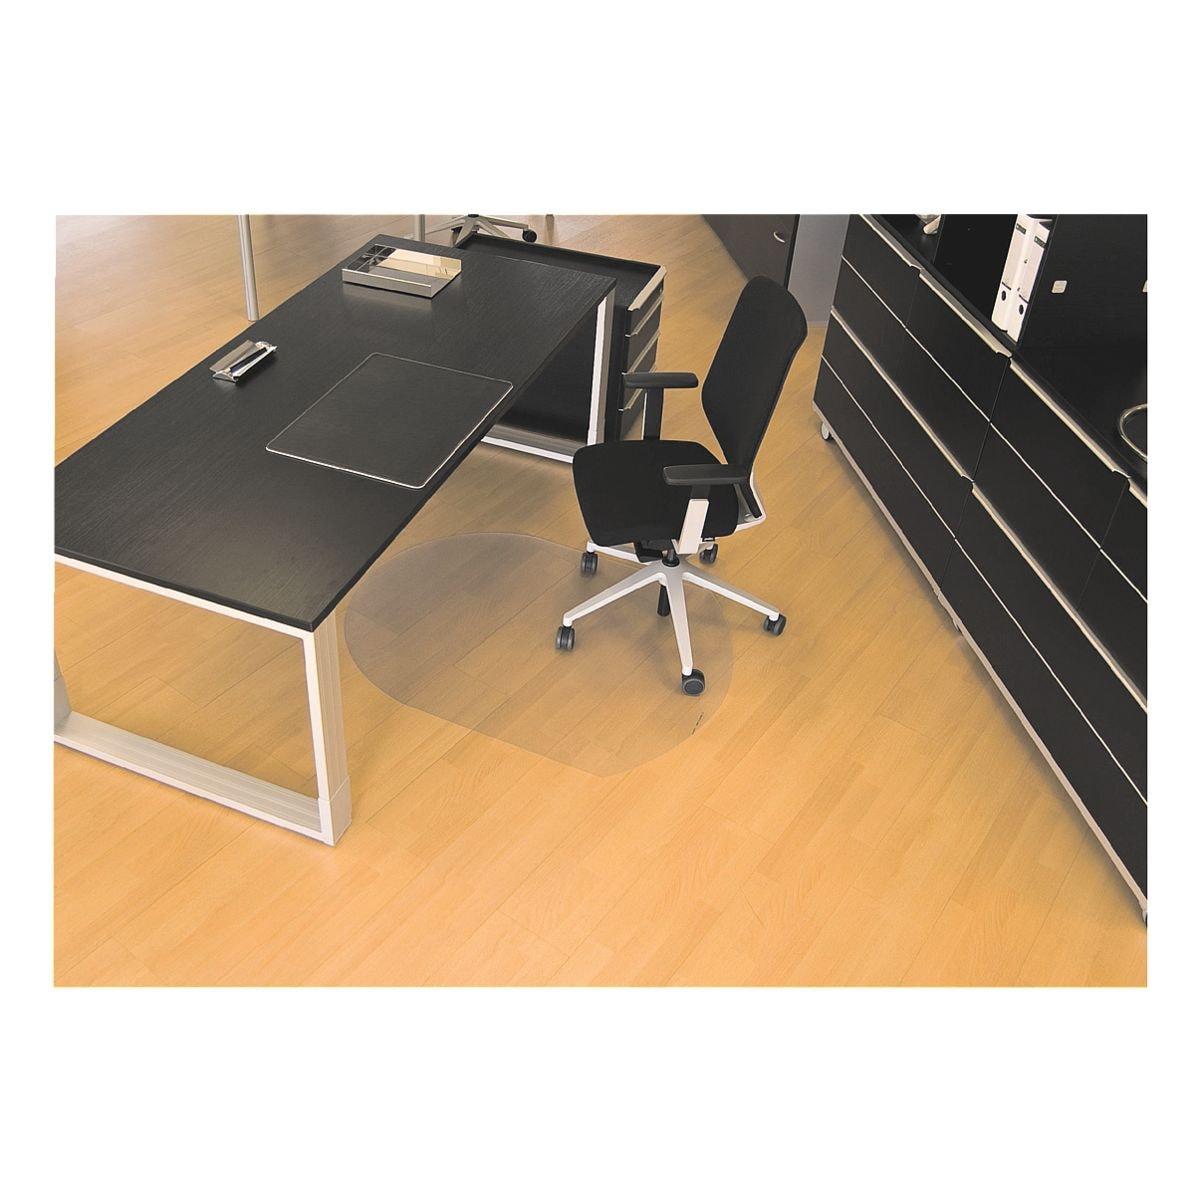 bodenschutzmatte f r hartb den makrolon sonderform t 90 x 120 cm rs office products rollsafe. Black Bedroom Furniture Sets. Home Design Ideas